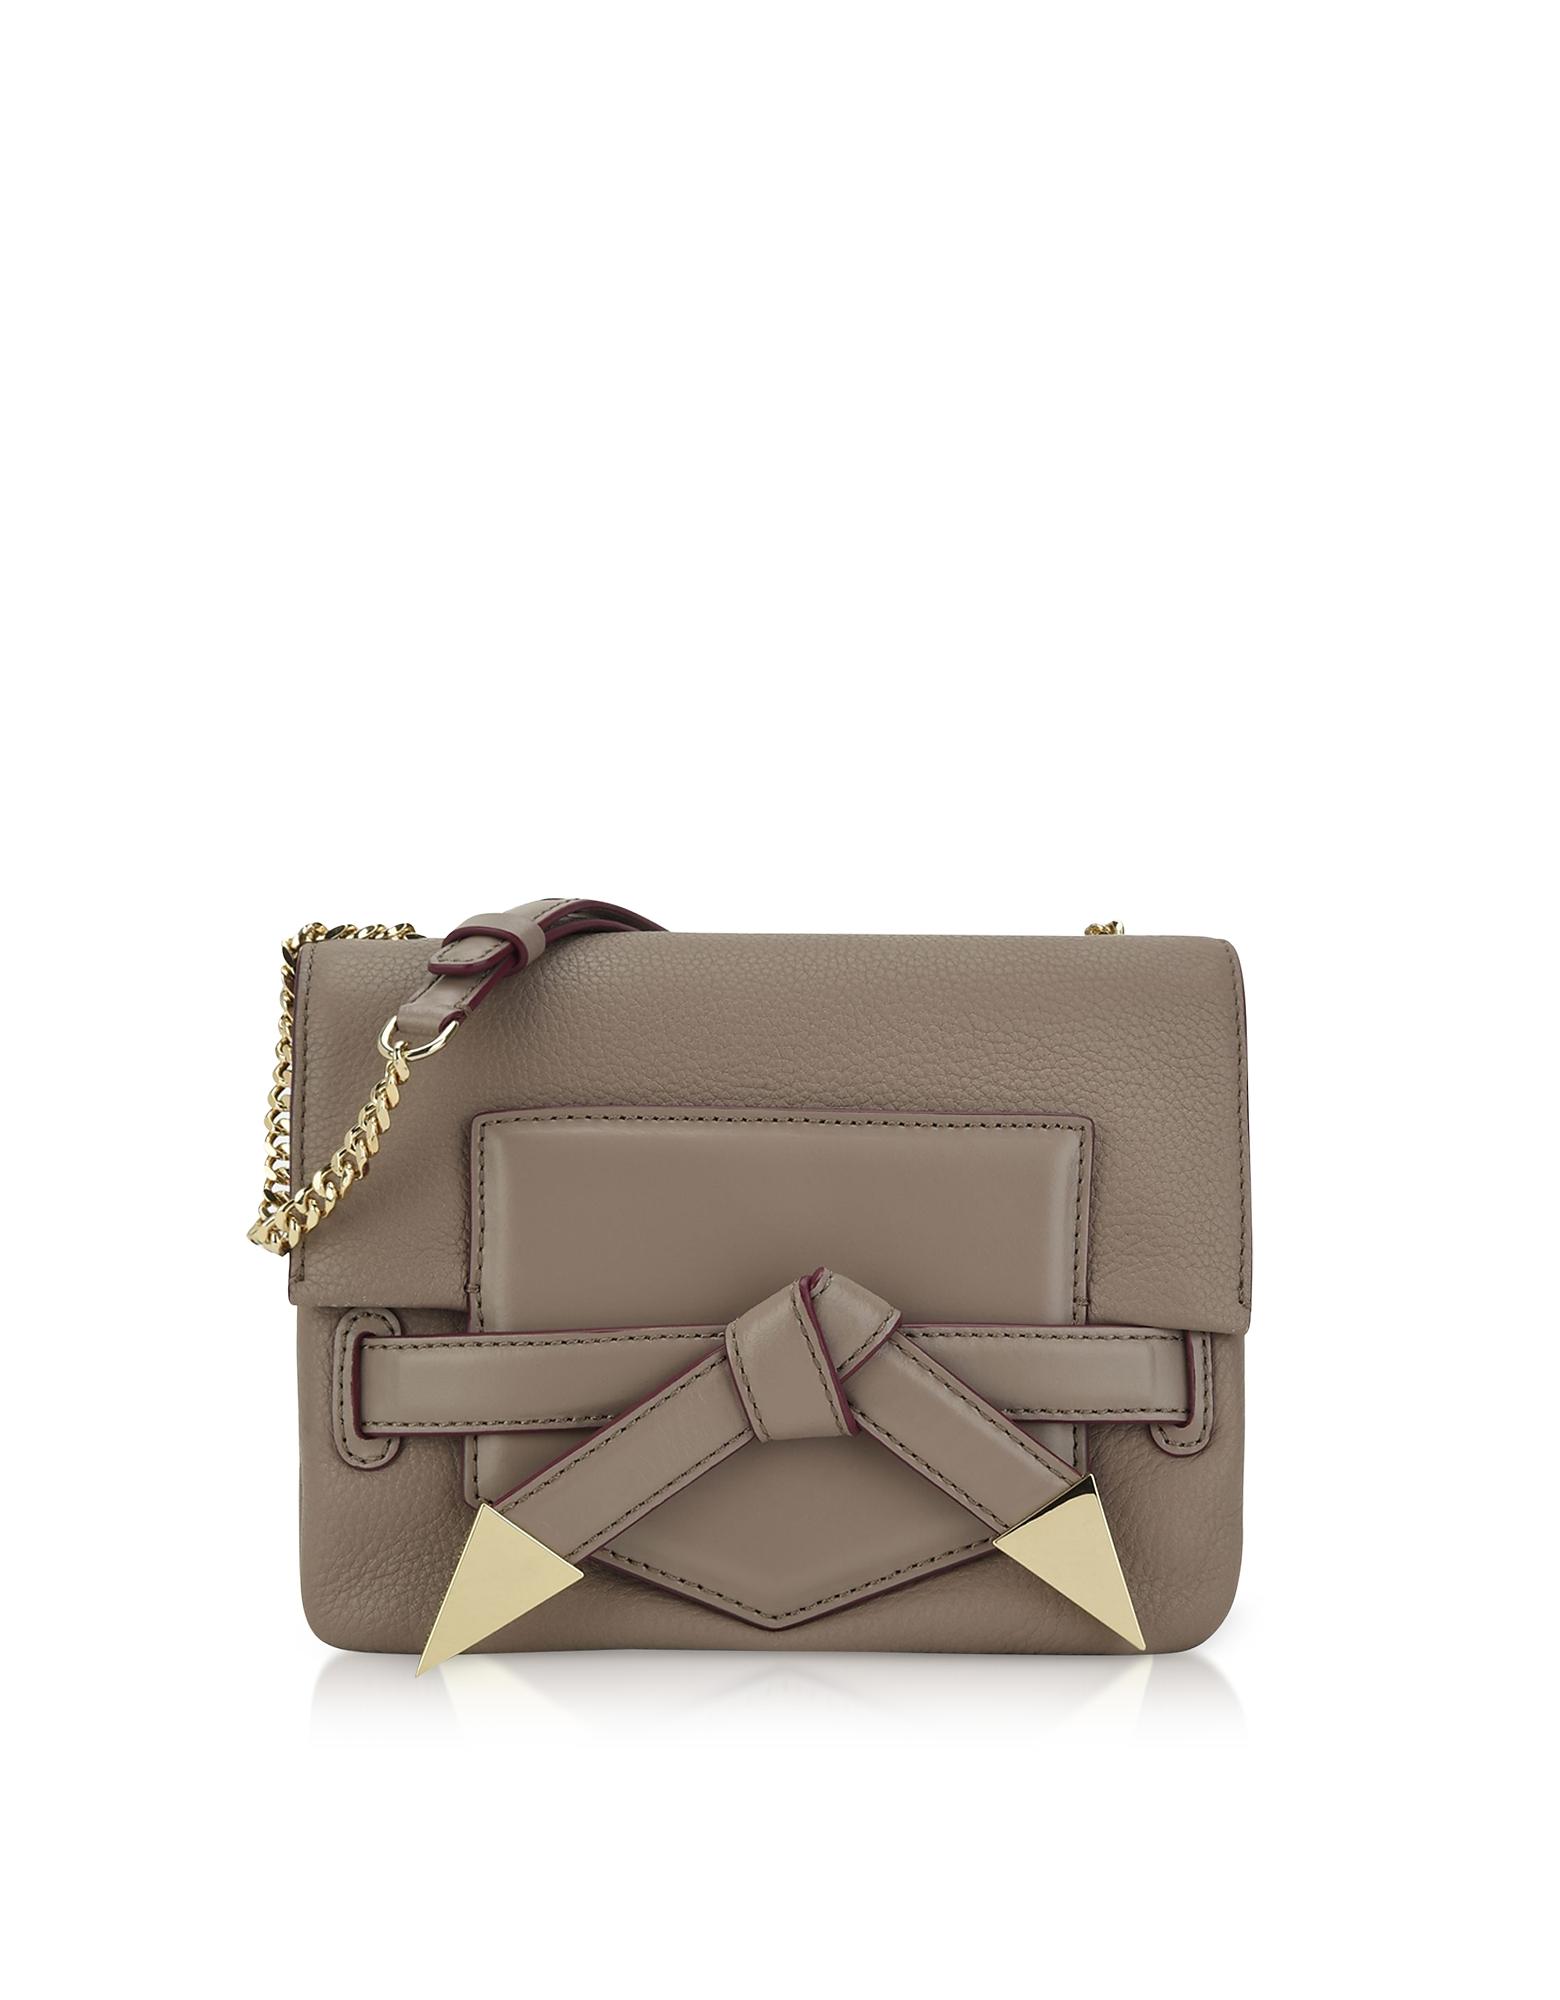 Karl Lagerfeld Handbags, Sand Stone Leather K/Rocky Bow Crossbody Bag